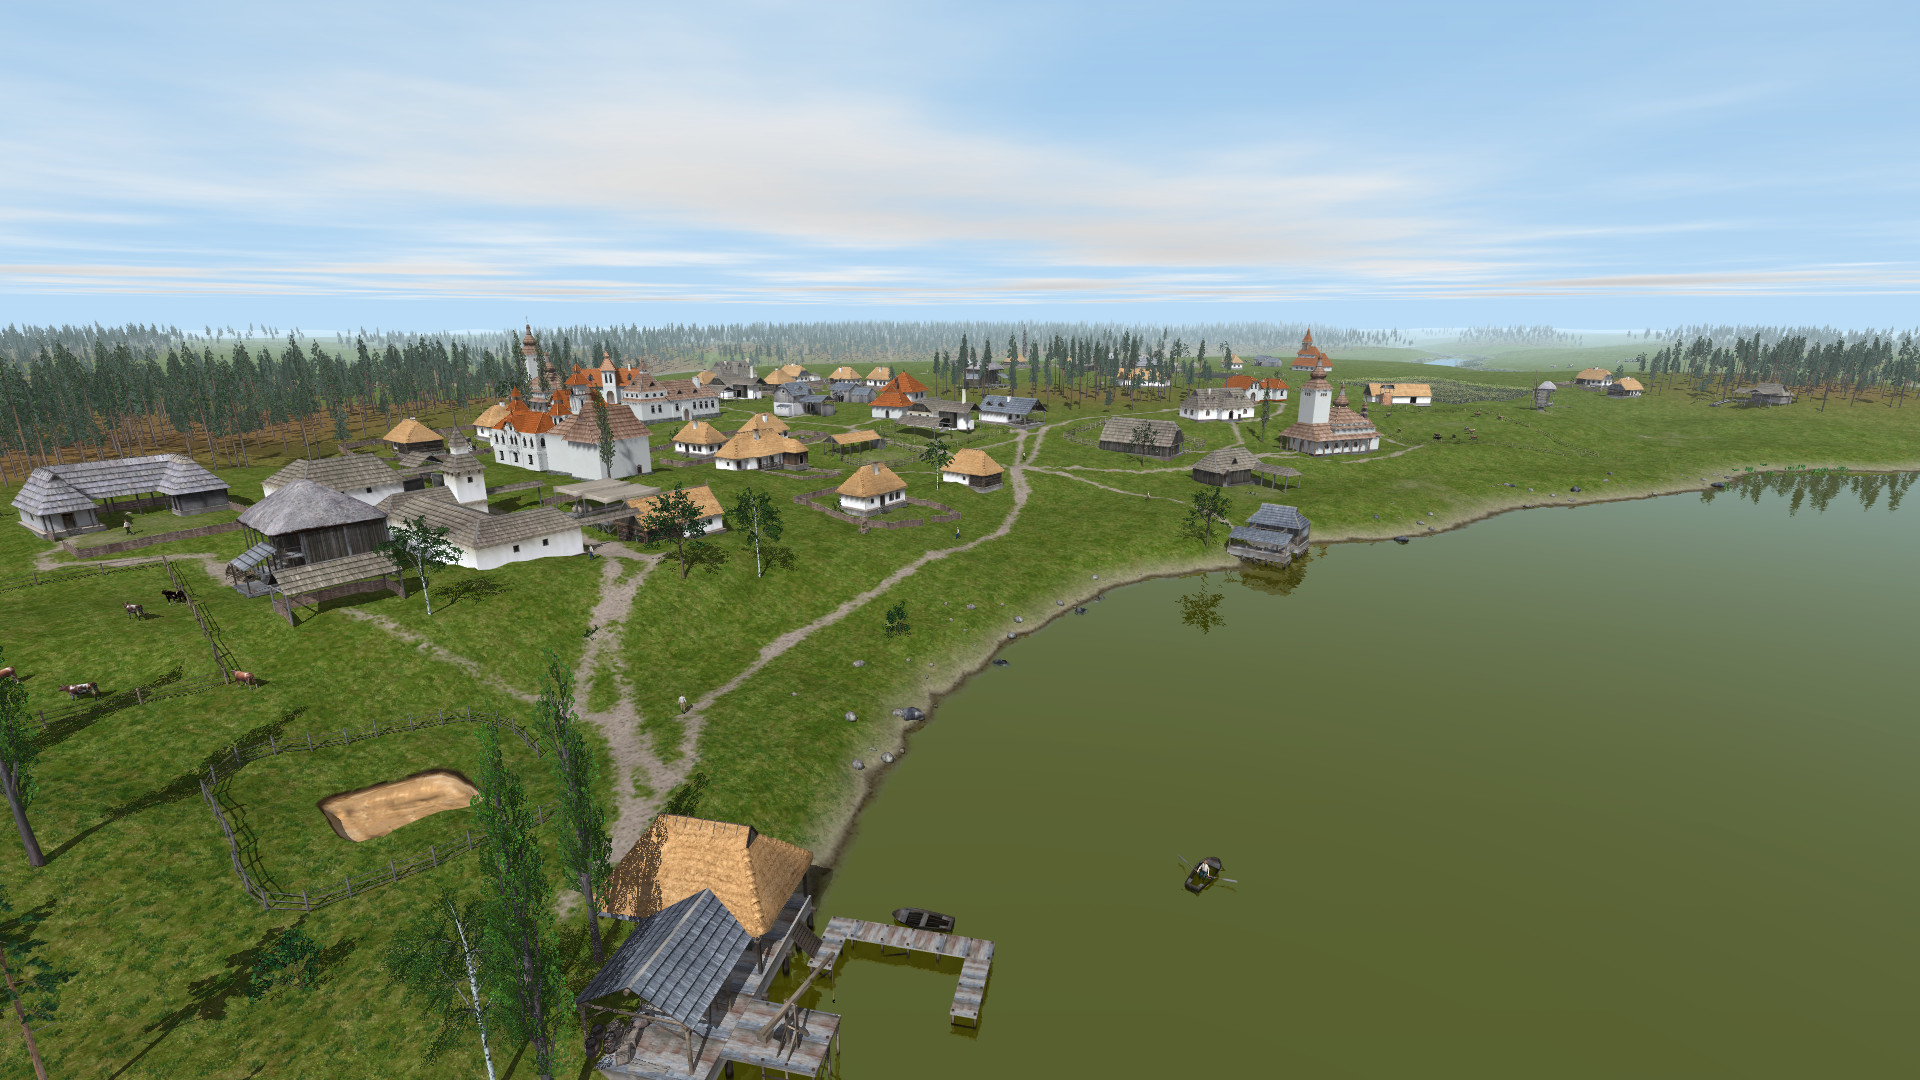 ostriv a city building game image mod db